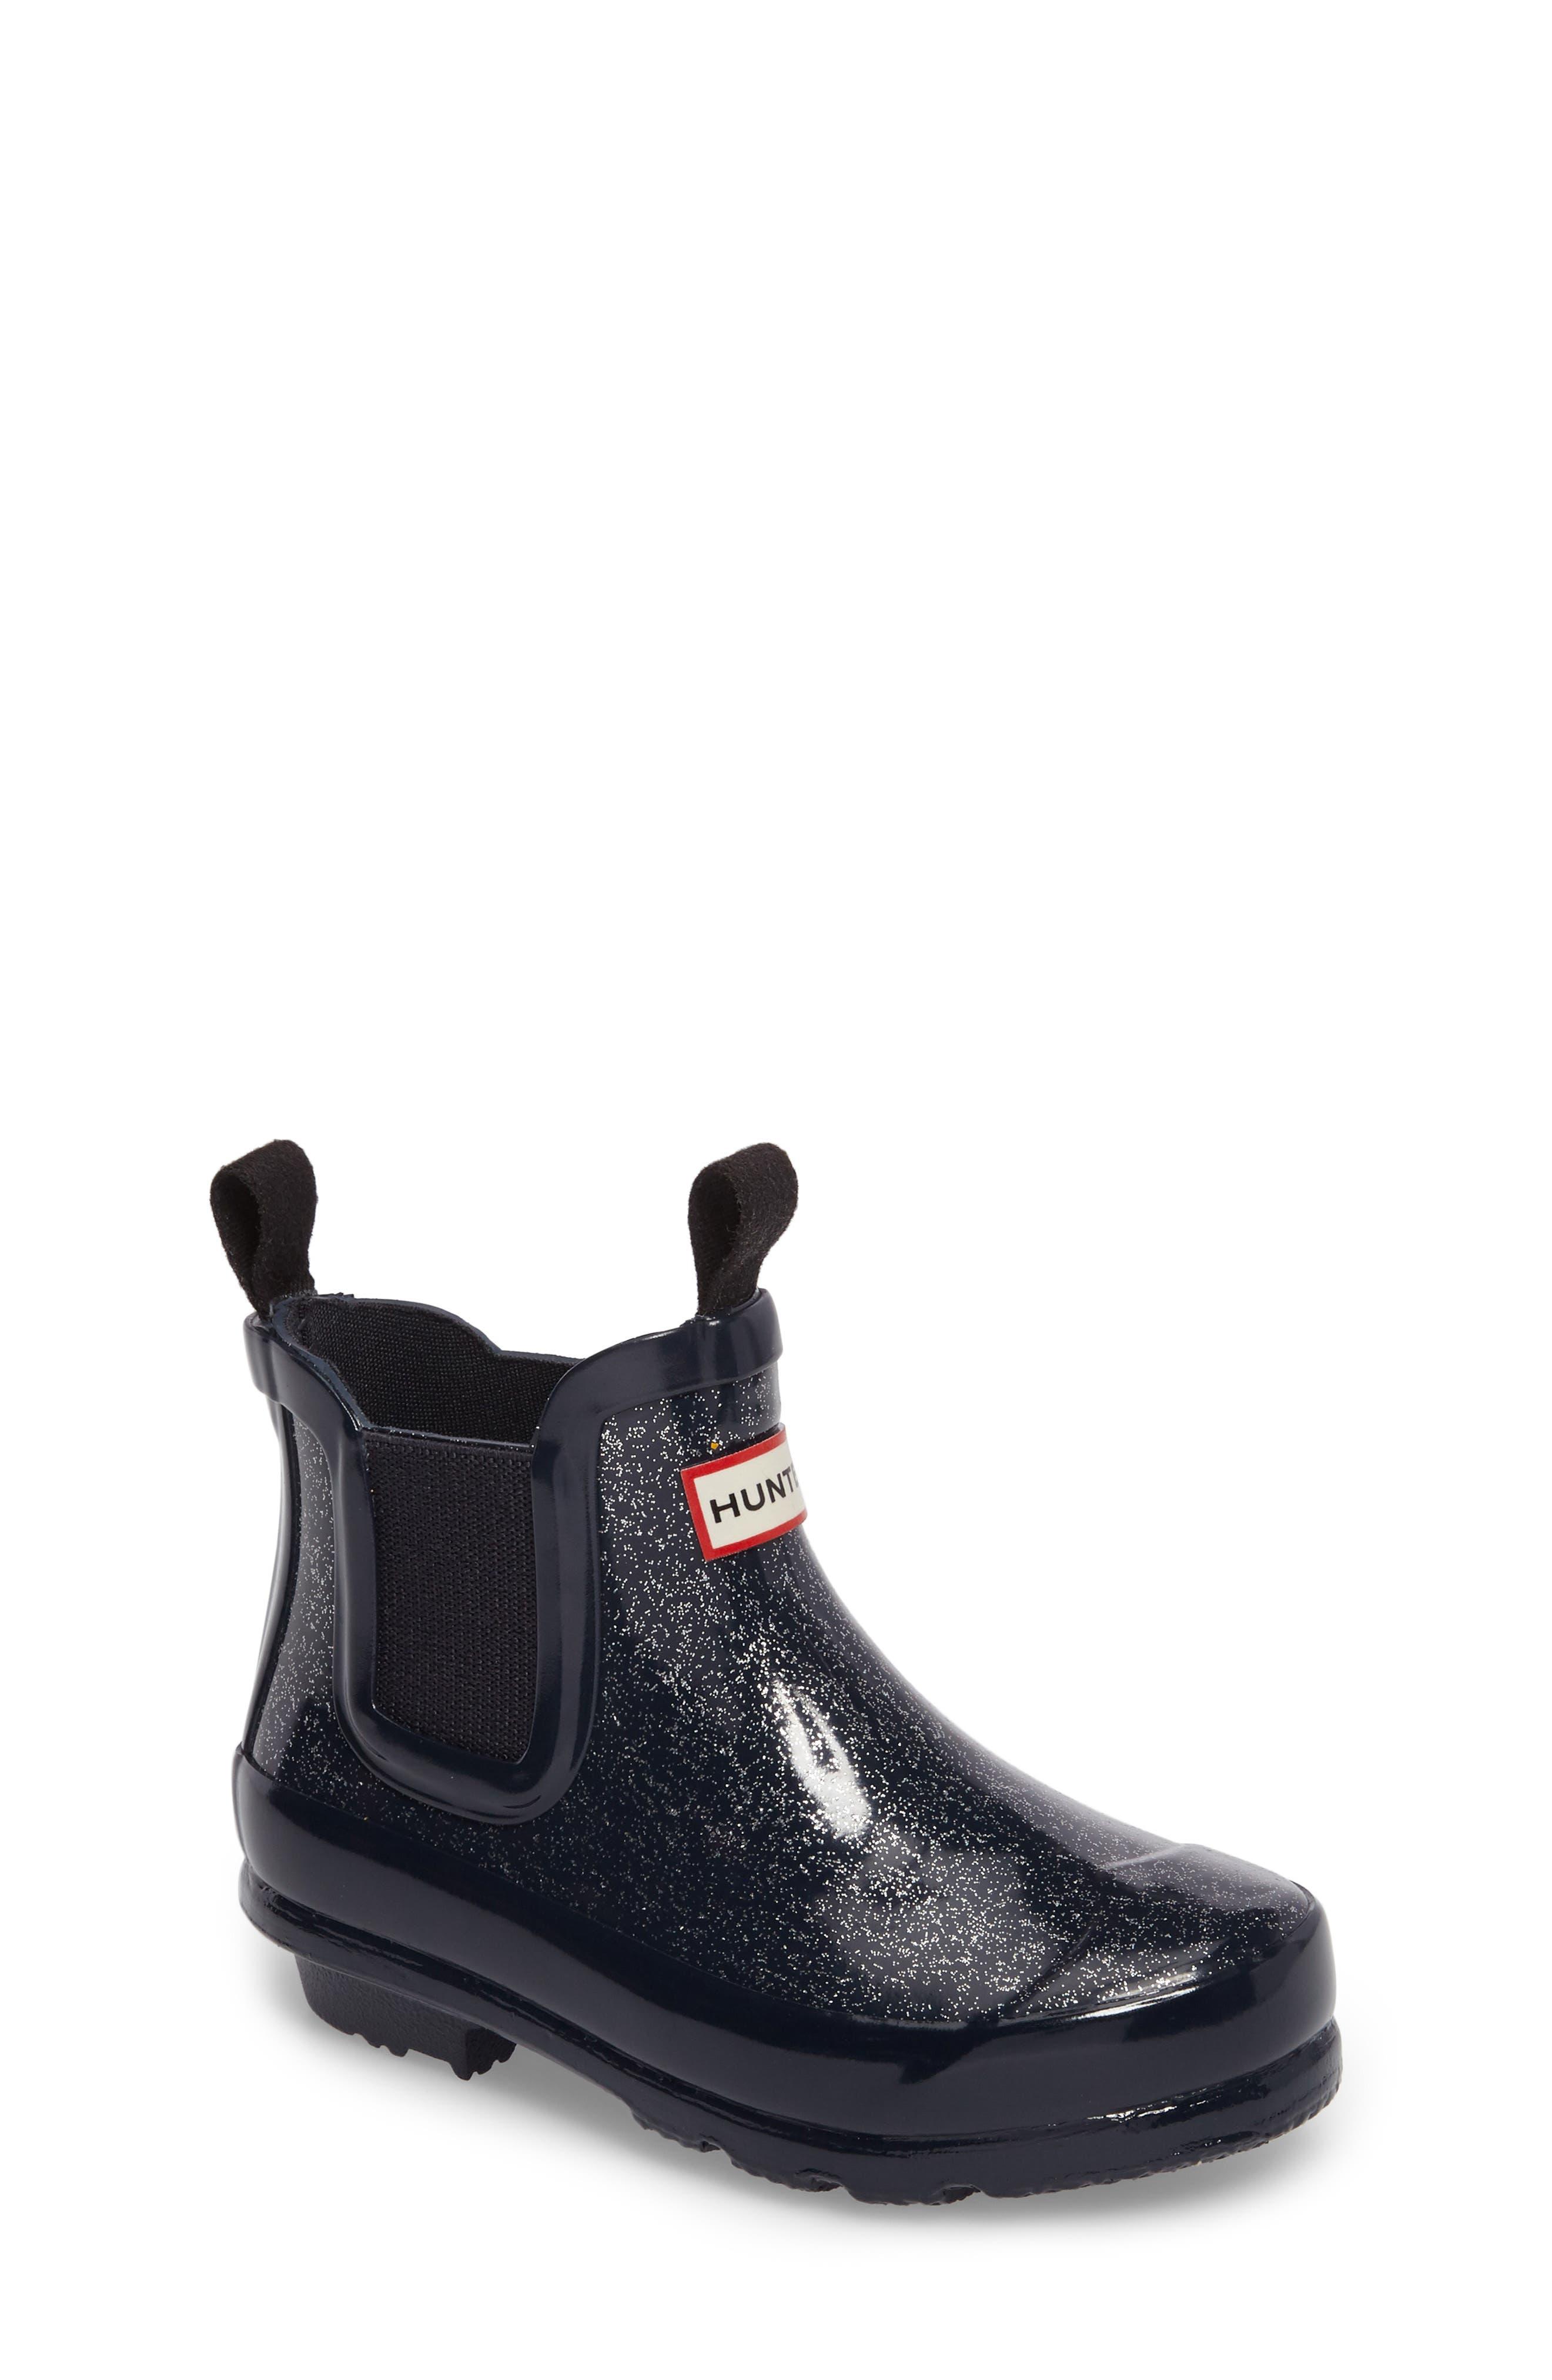 Main Image - Hunter Originals Glittery Waterproof Chelsea Boot (Toddler)